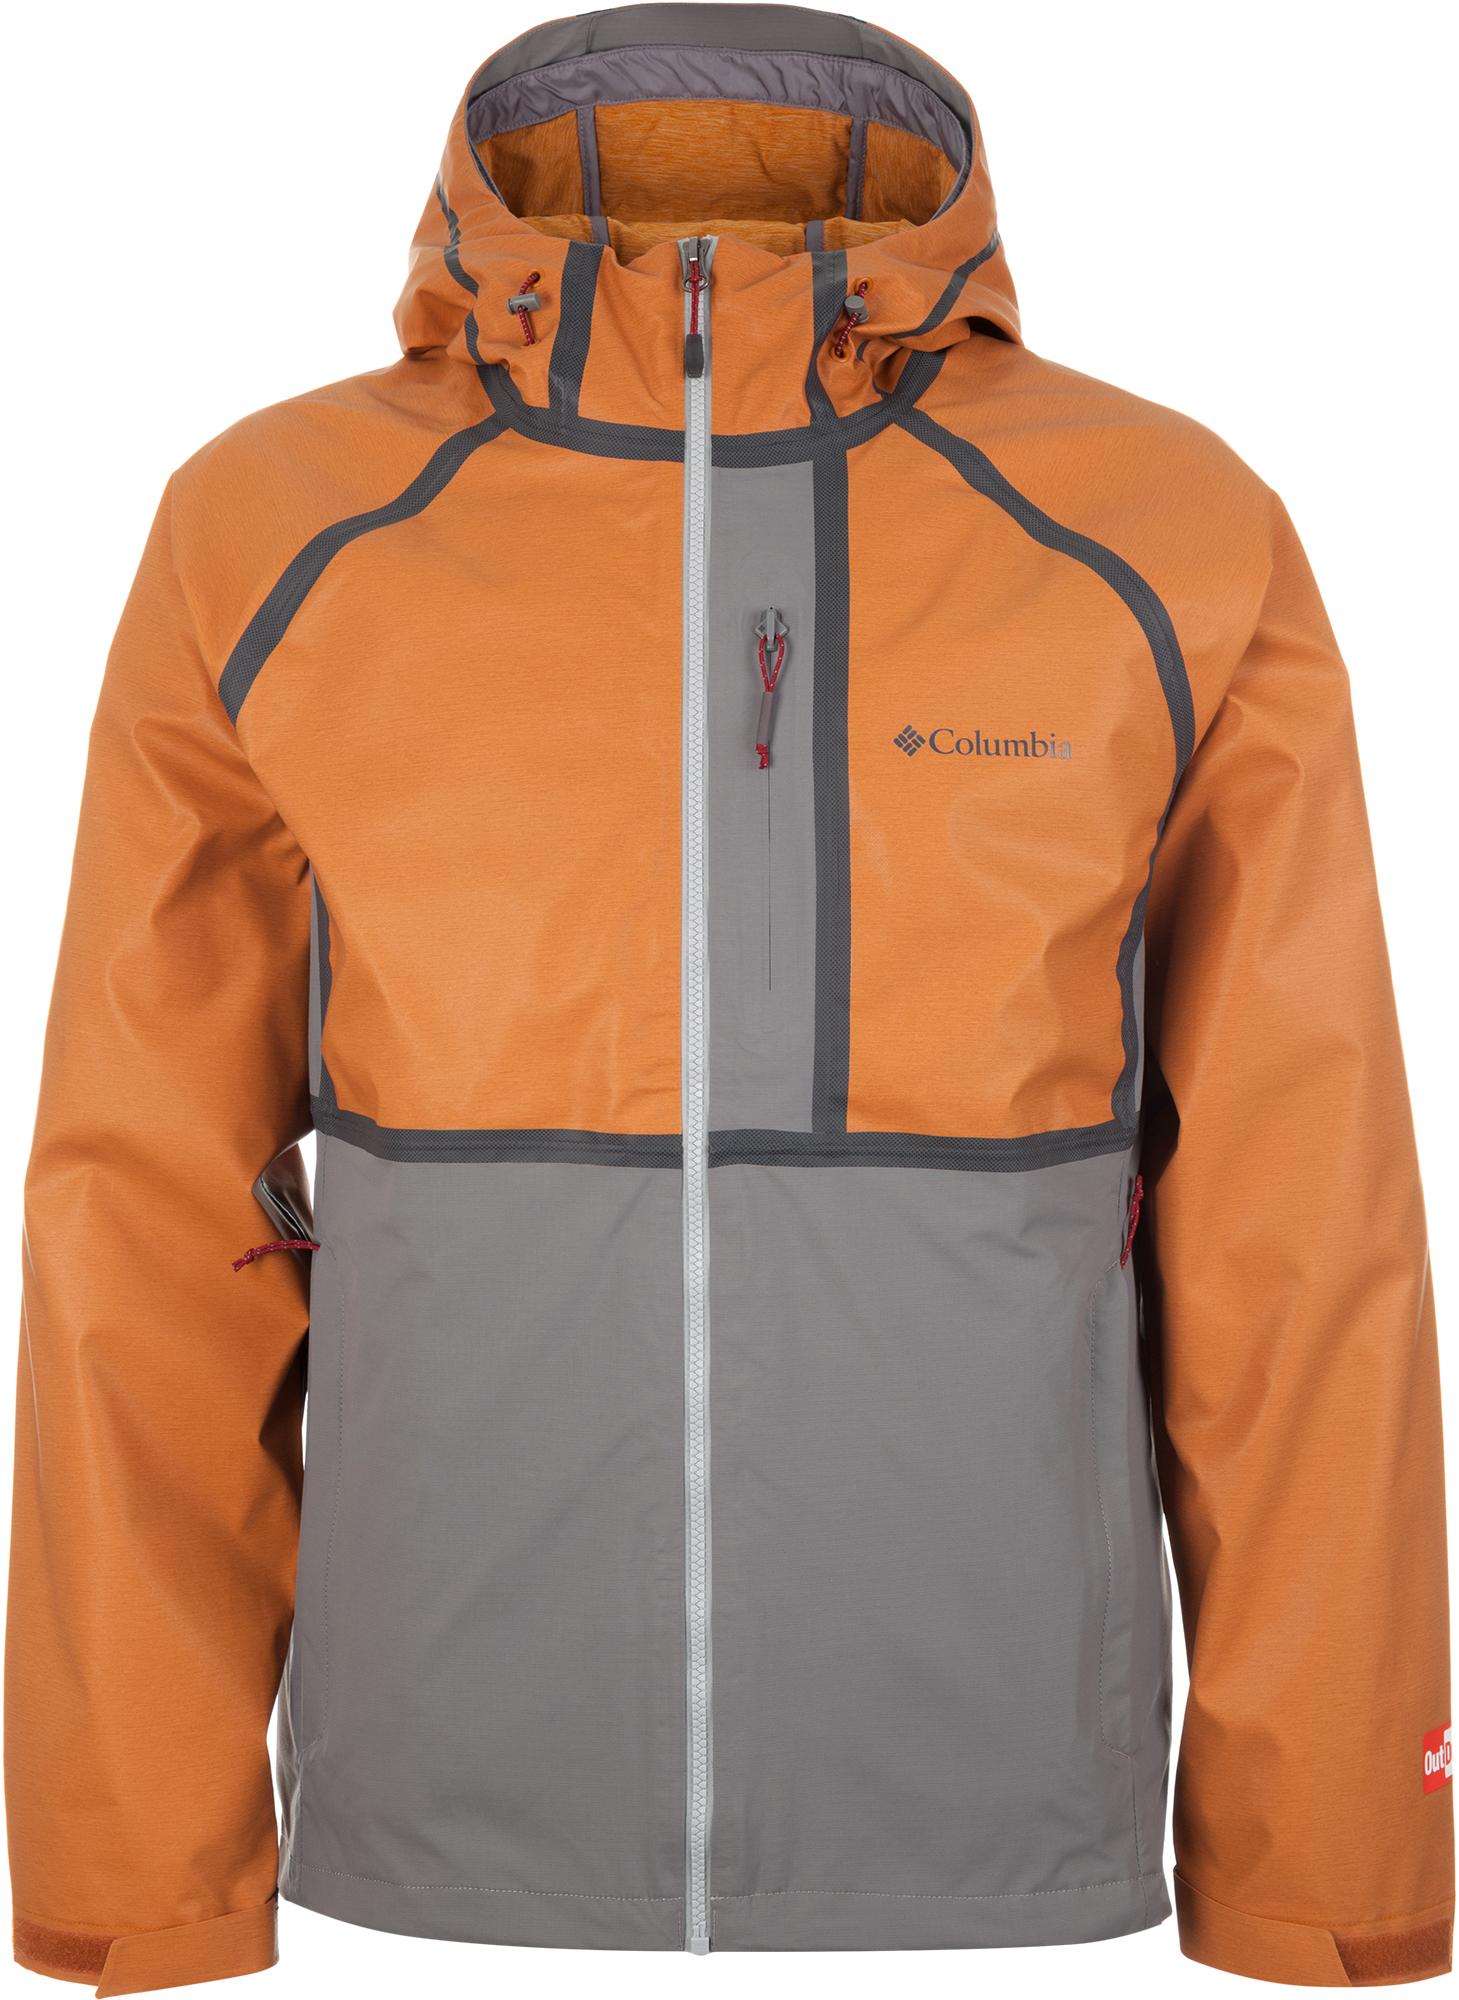 Columbia Куртка 3 в 1 мужская Columbia OutDry Rogue, размер 56-58 цена и фото